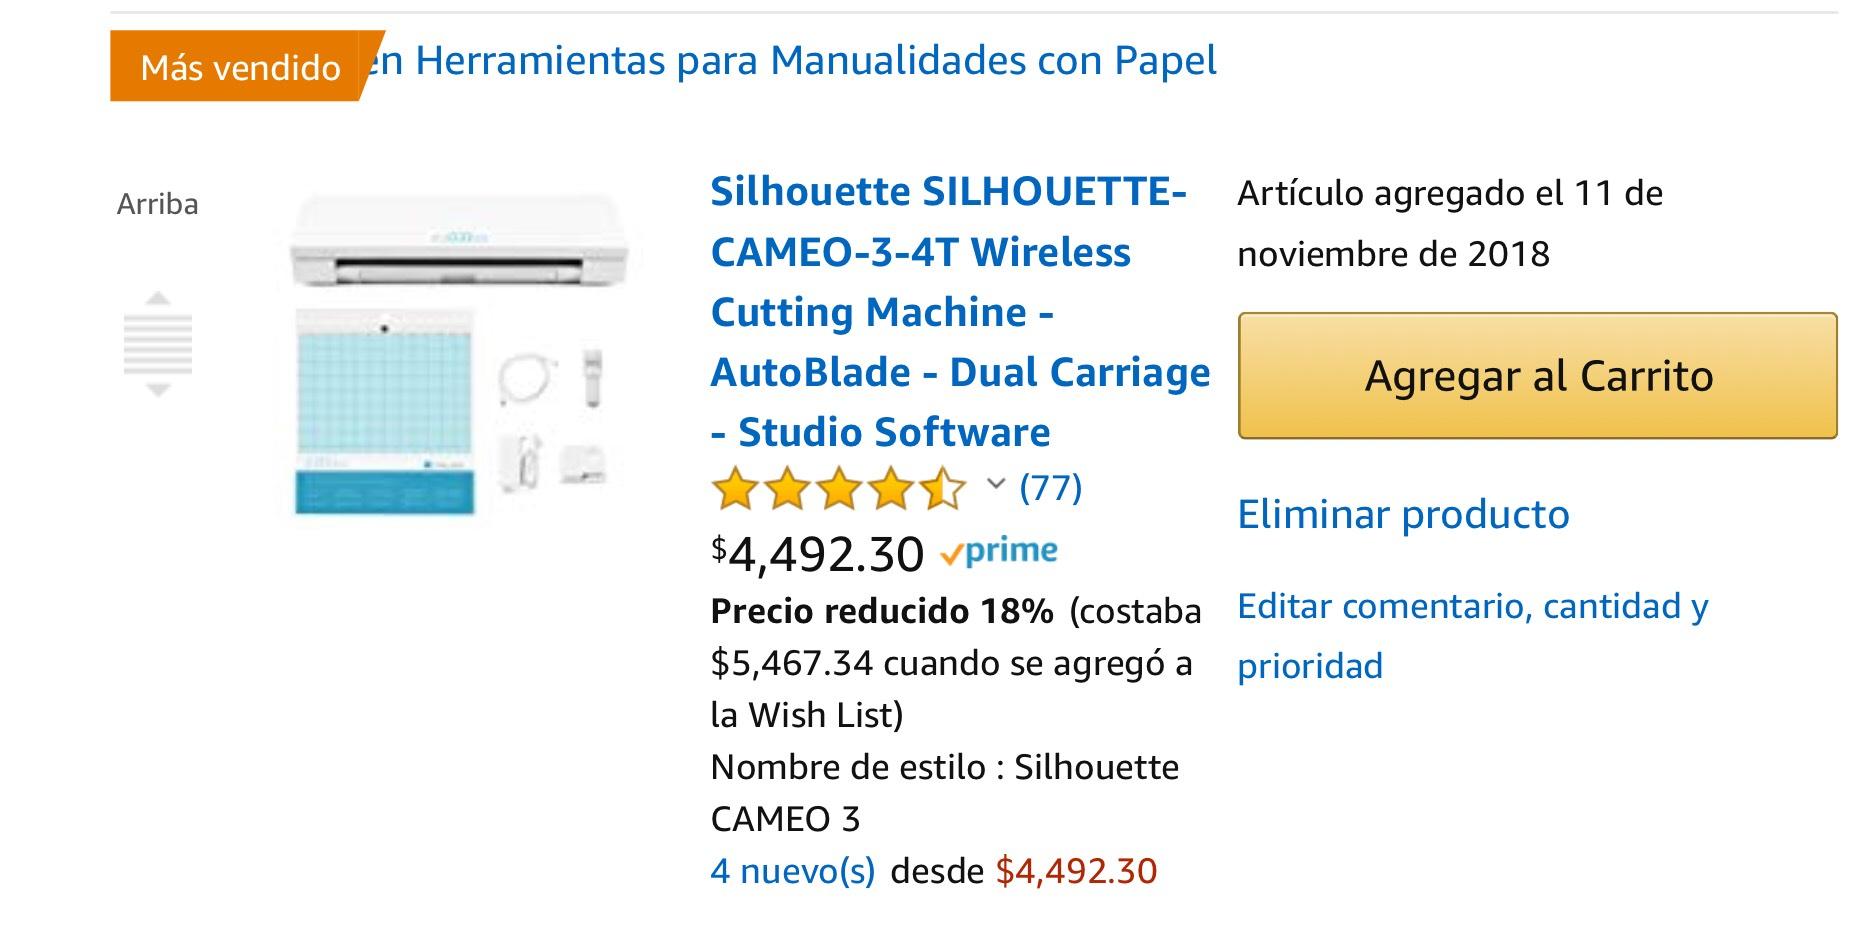 Amazon Plotter de corte Silhouette SILHOUETTE-CAMEO-3-4T Wireless Cutting Machine - AutoBlade - Dual Carriage - Studio Software